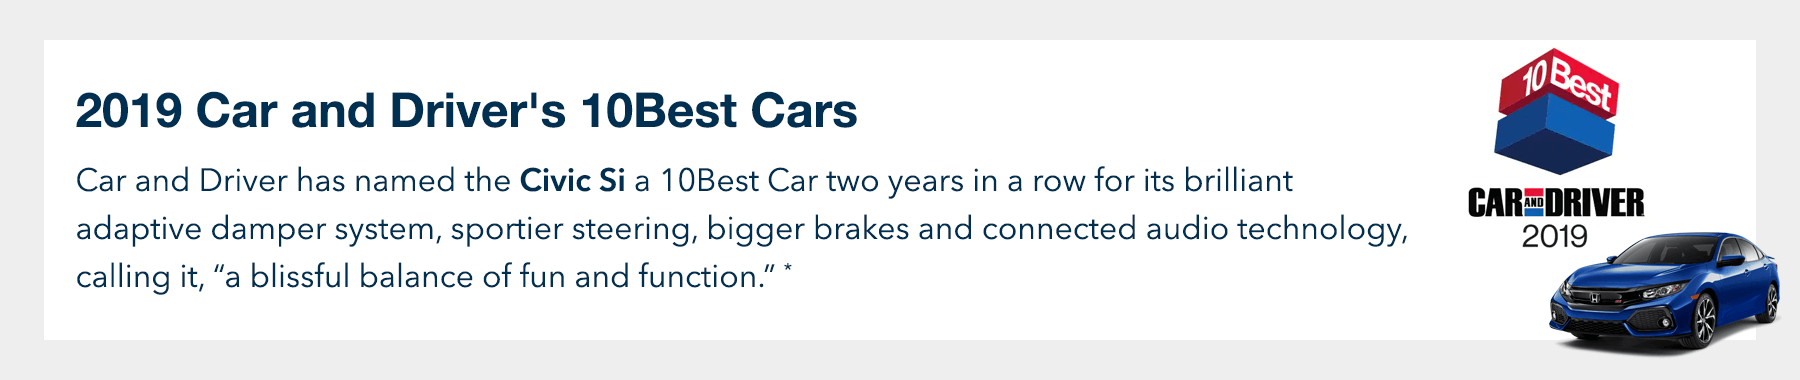 2019 Honda Civic Si Car and Driver 10Best Award Slider